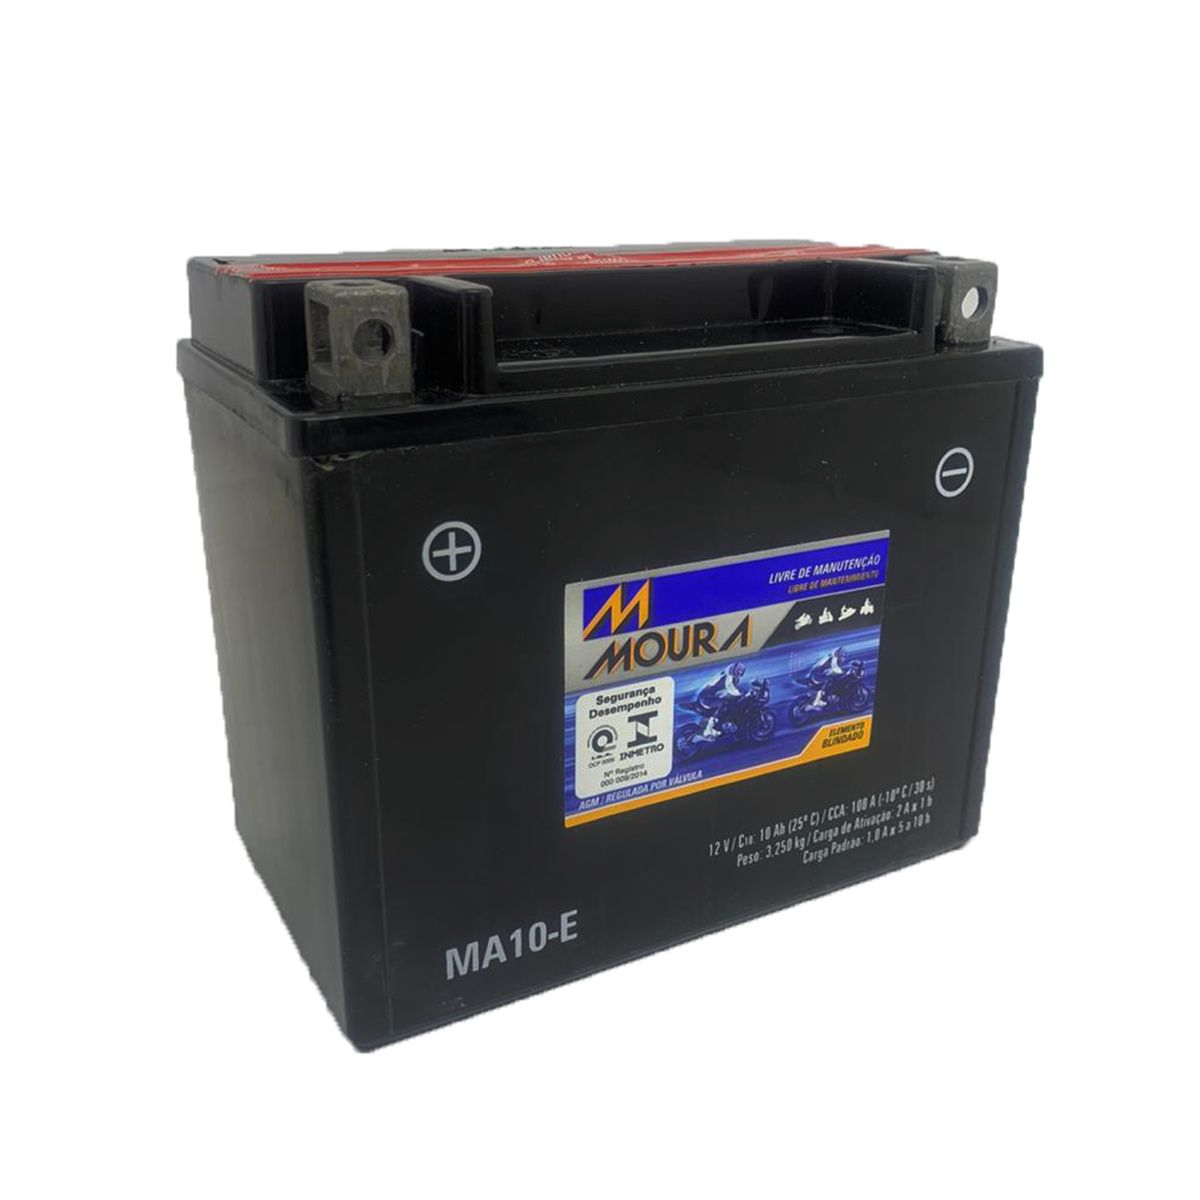 Bateria Moura 10ah Gsx 1300 Hayabusa 1000/750 W Gs 500 Bandit 650 12v